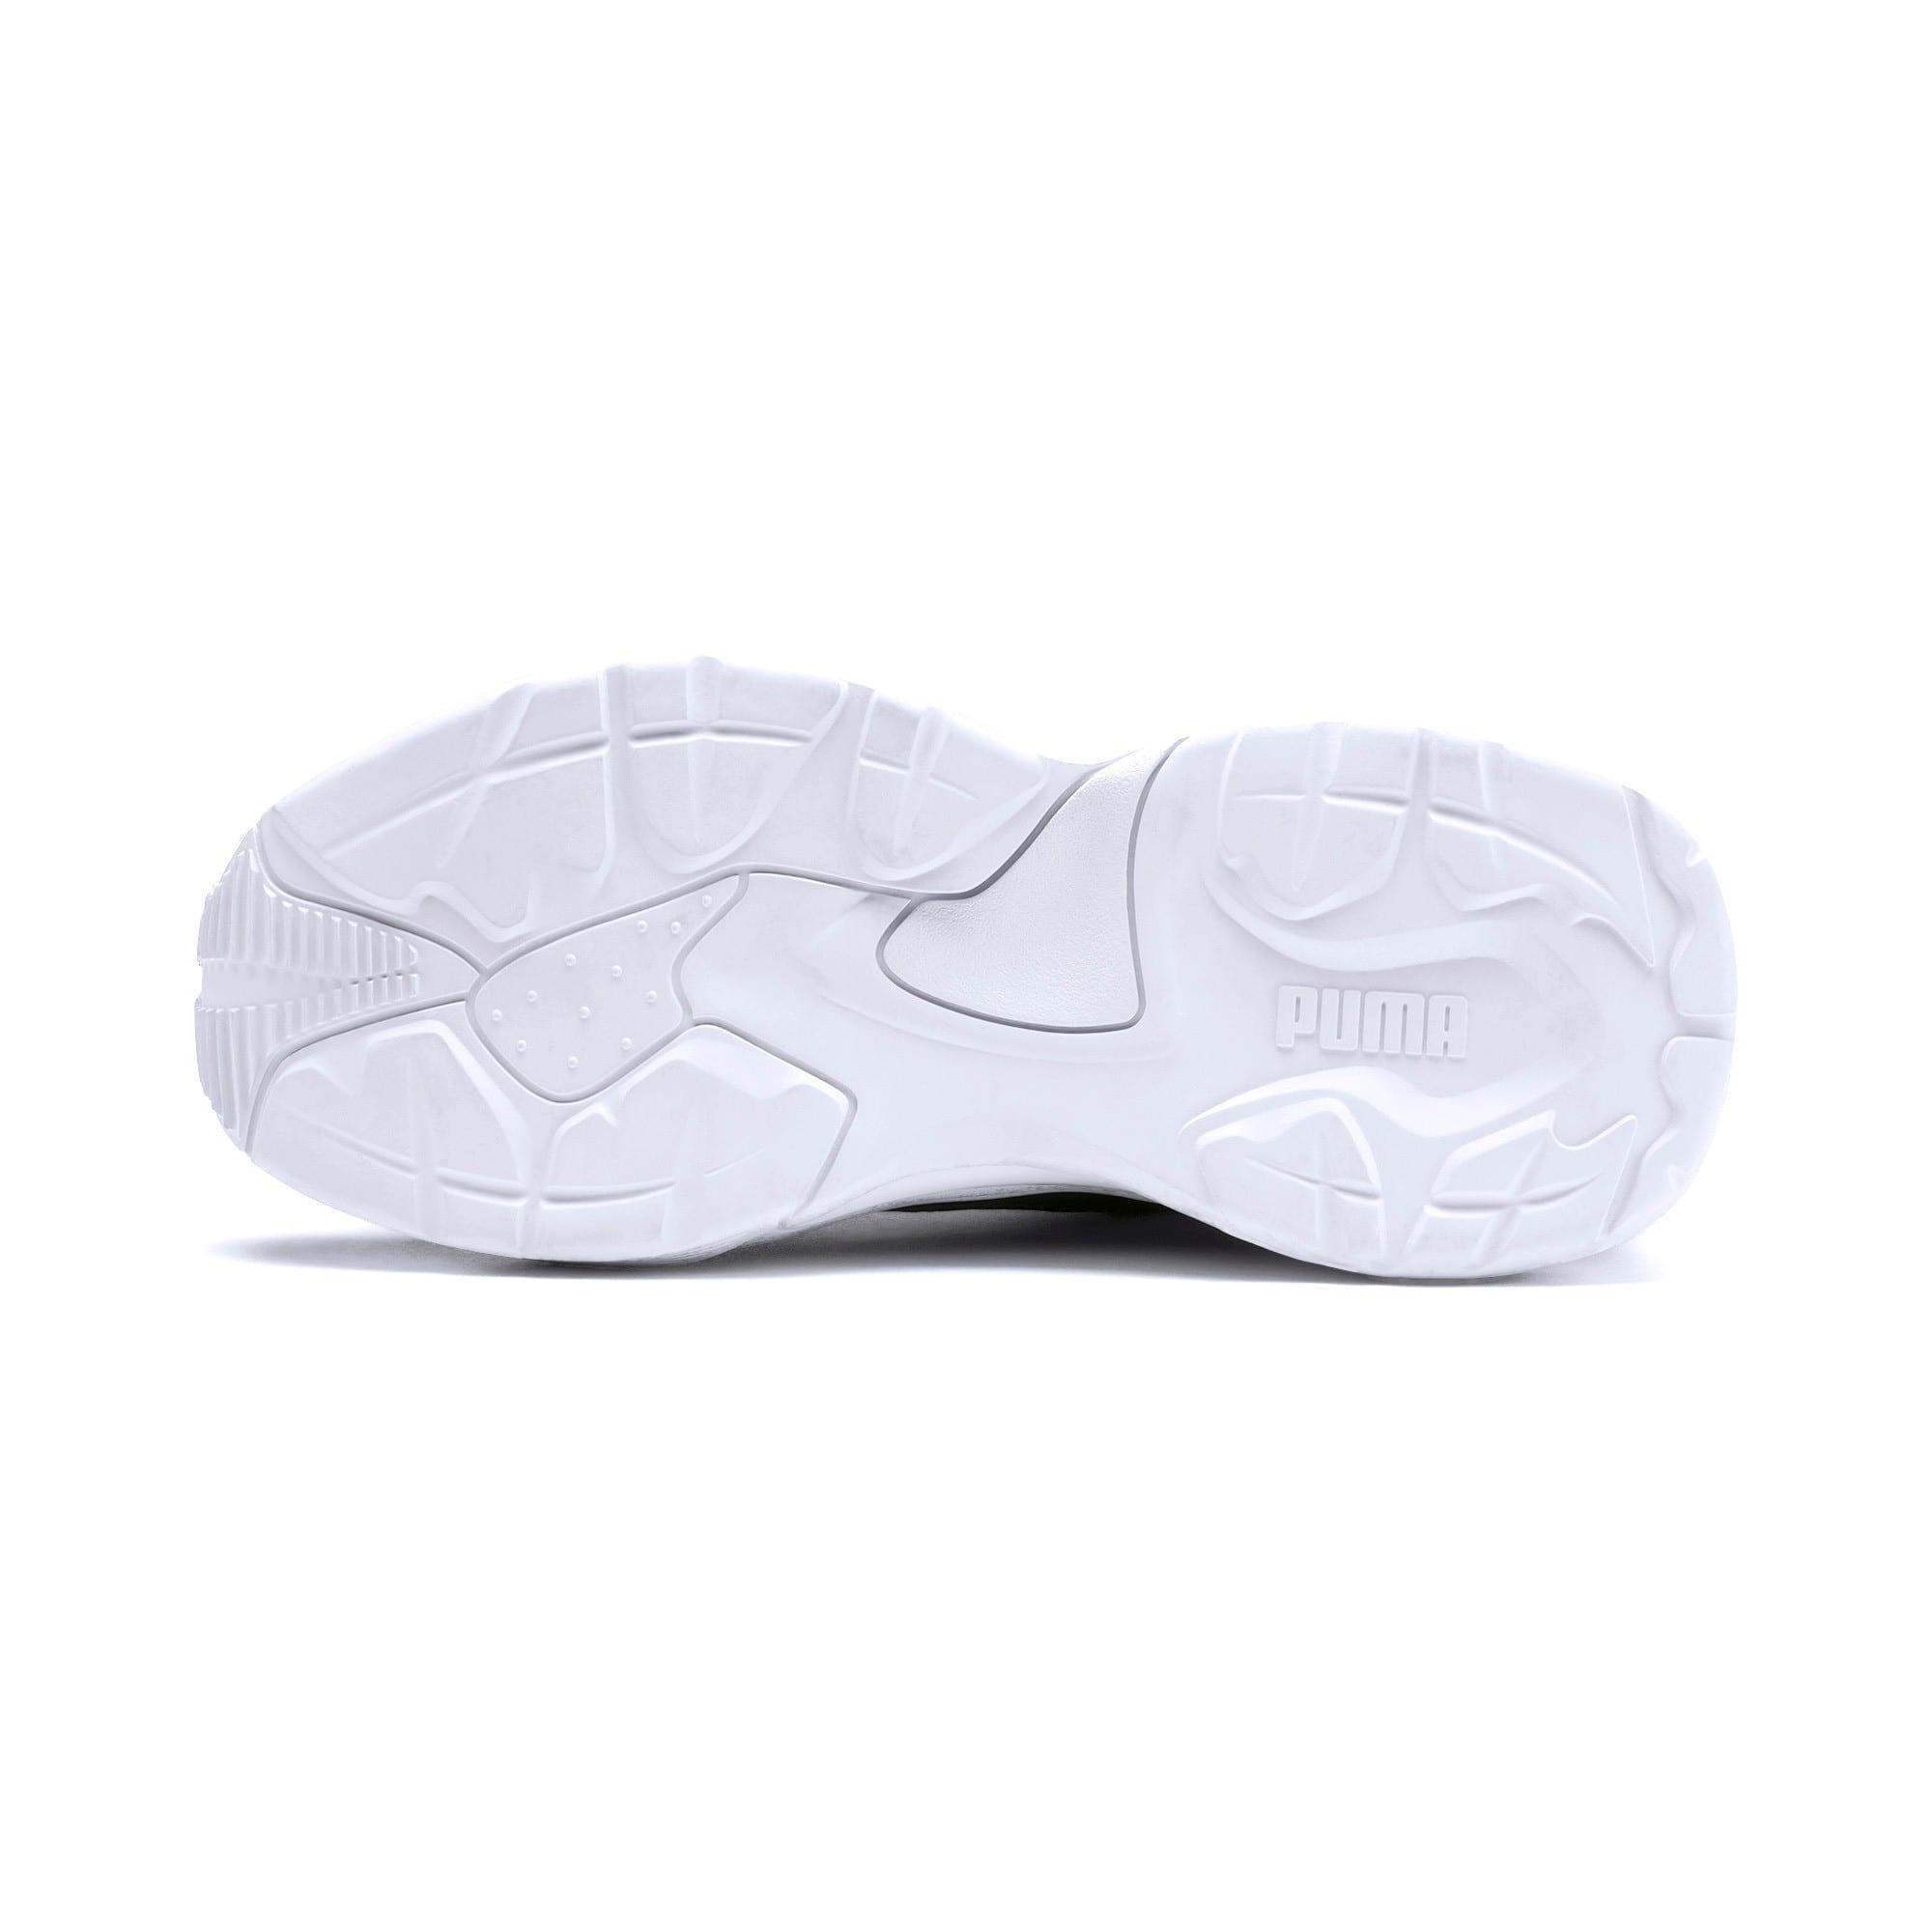 Miniatura 5 de Zapatos deportivos Thunder Distressed para mujer, Ebony-Puma Silver, mediano